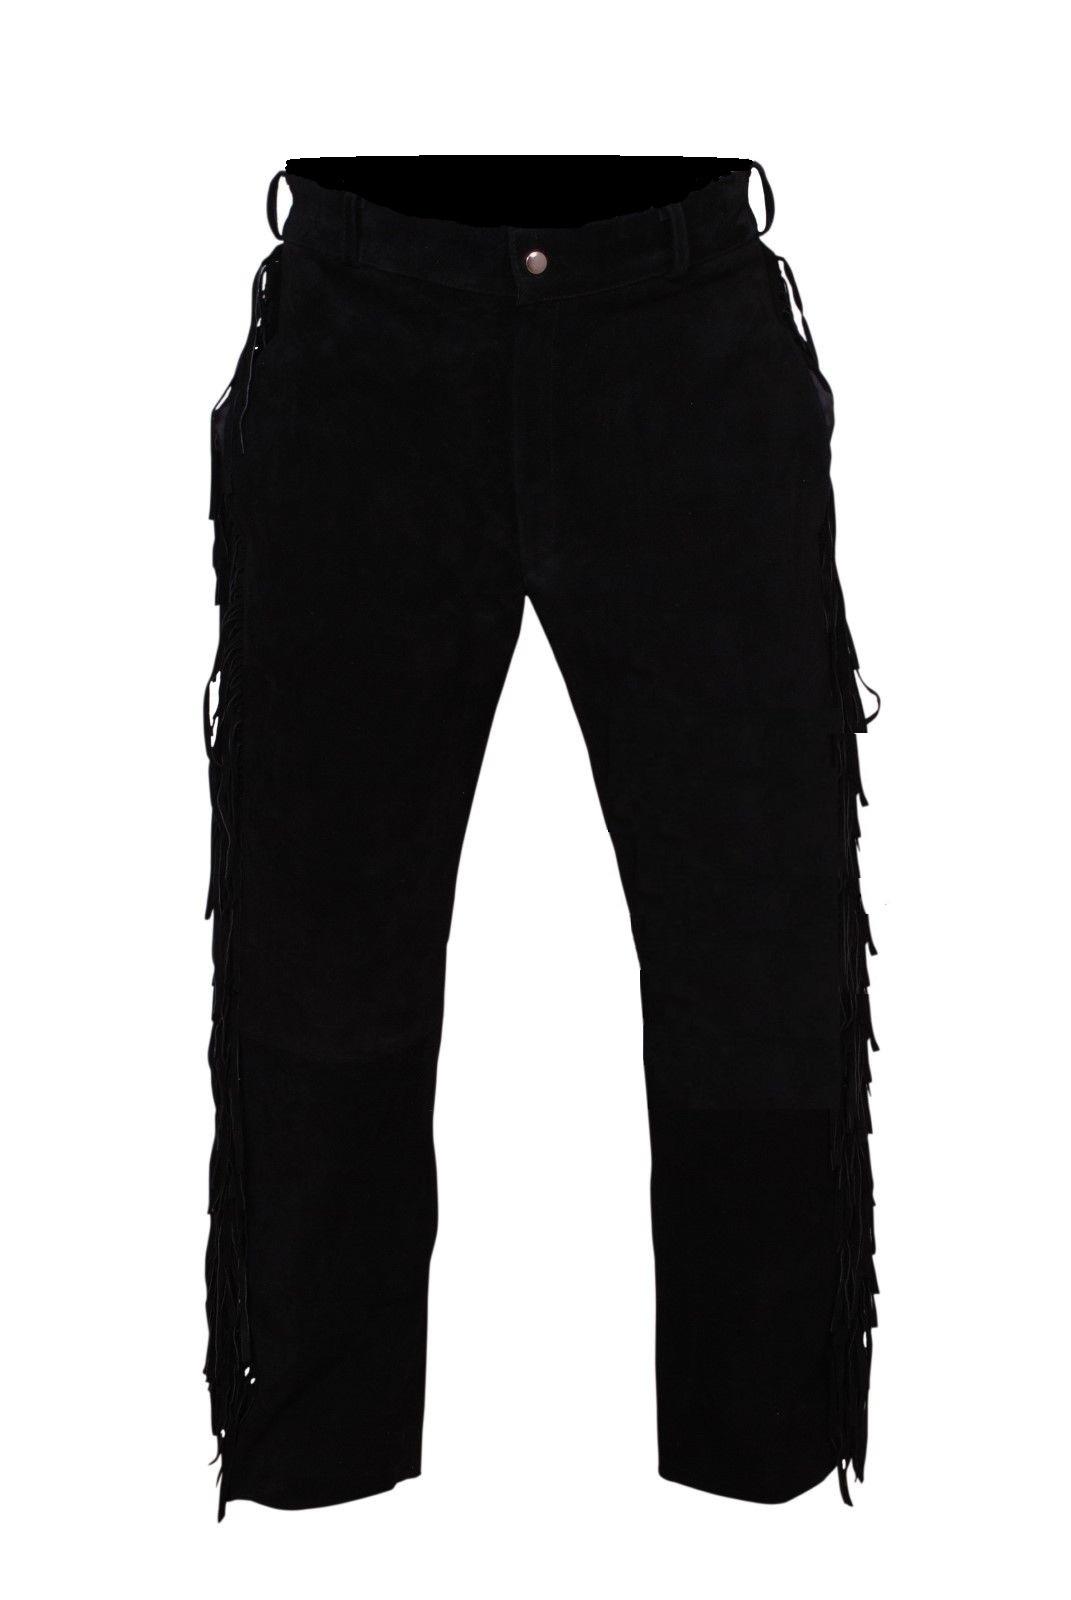 Men New Native American Buckskin Black Goat Suede Leather Bead Shirt & Pant WS69 image 7